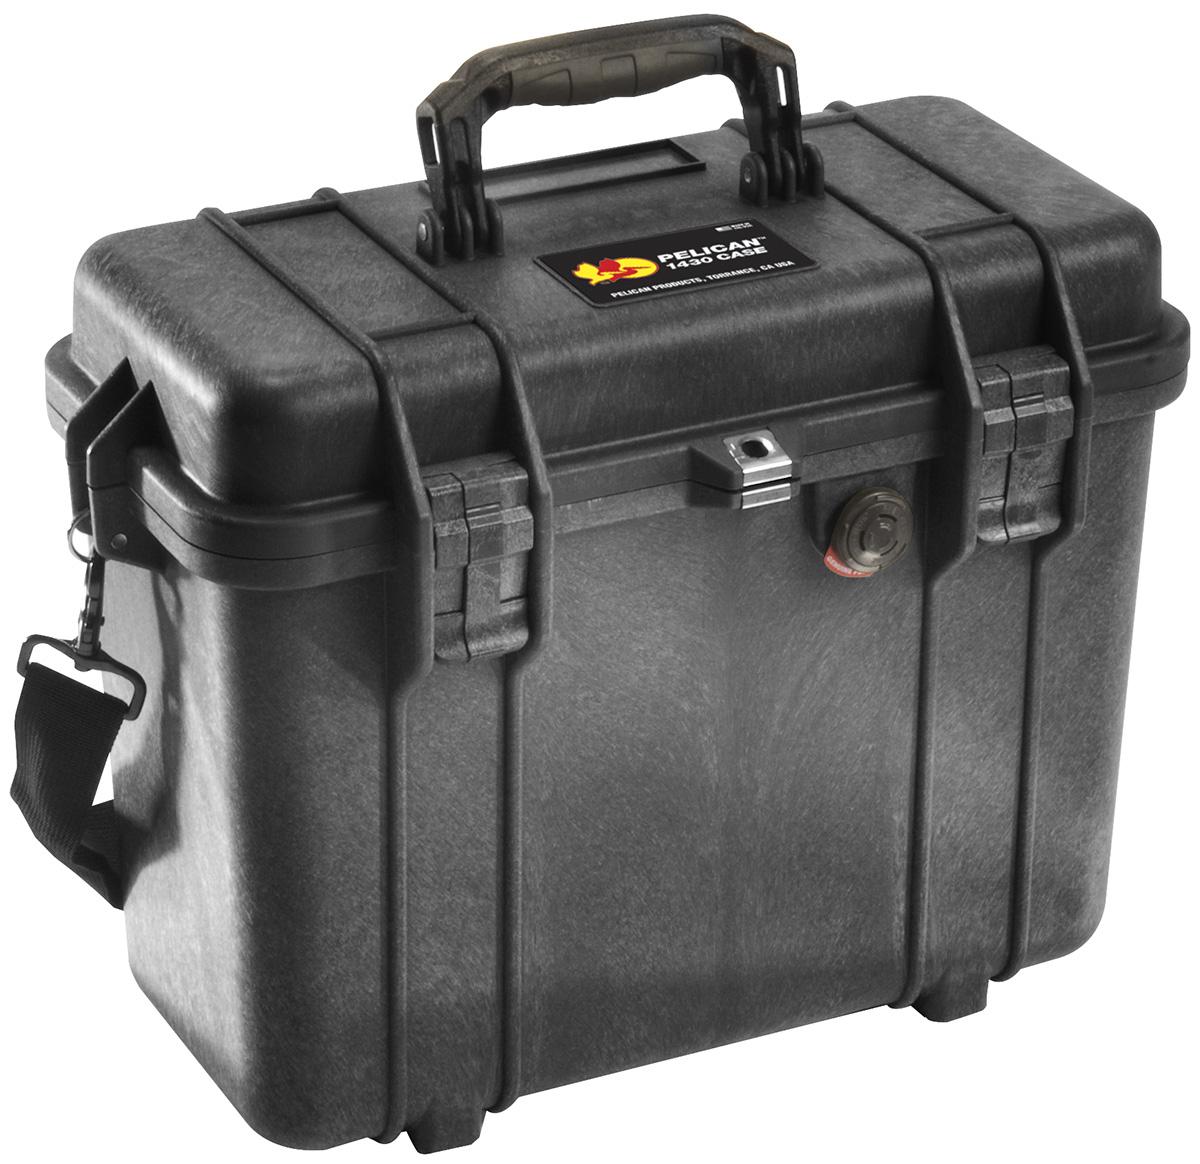 1430 Top Loader Case - No Foam